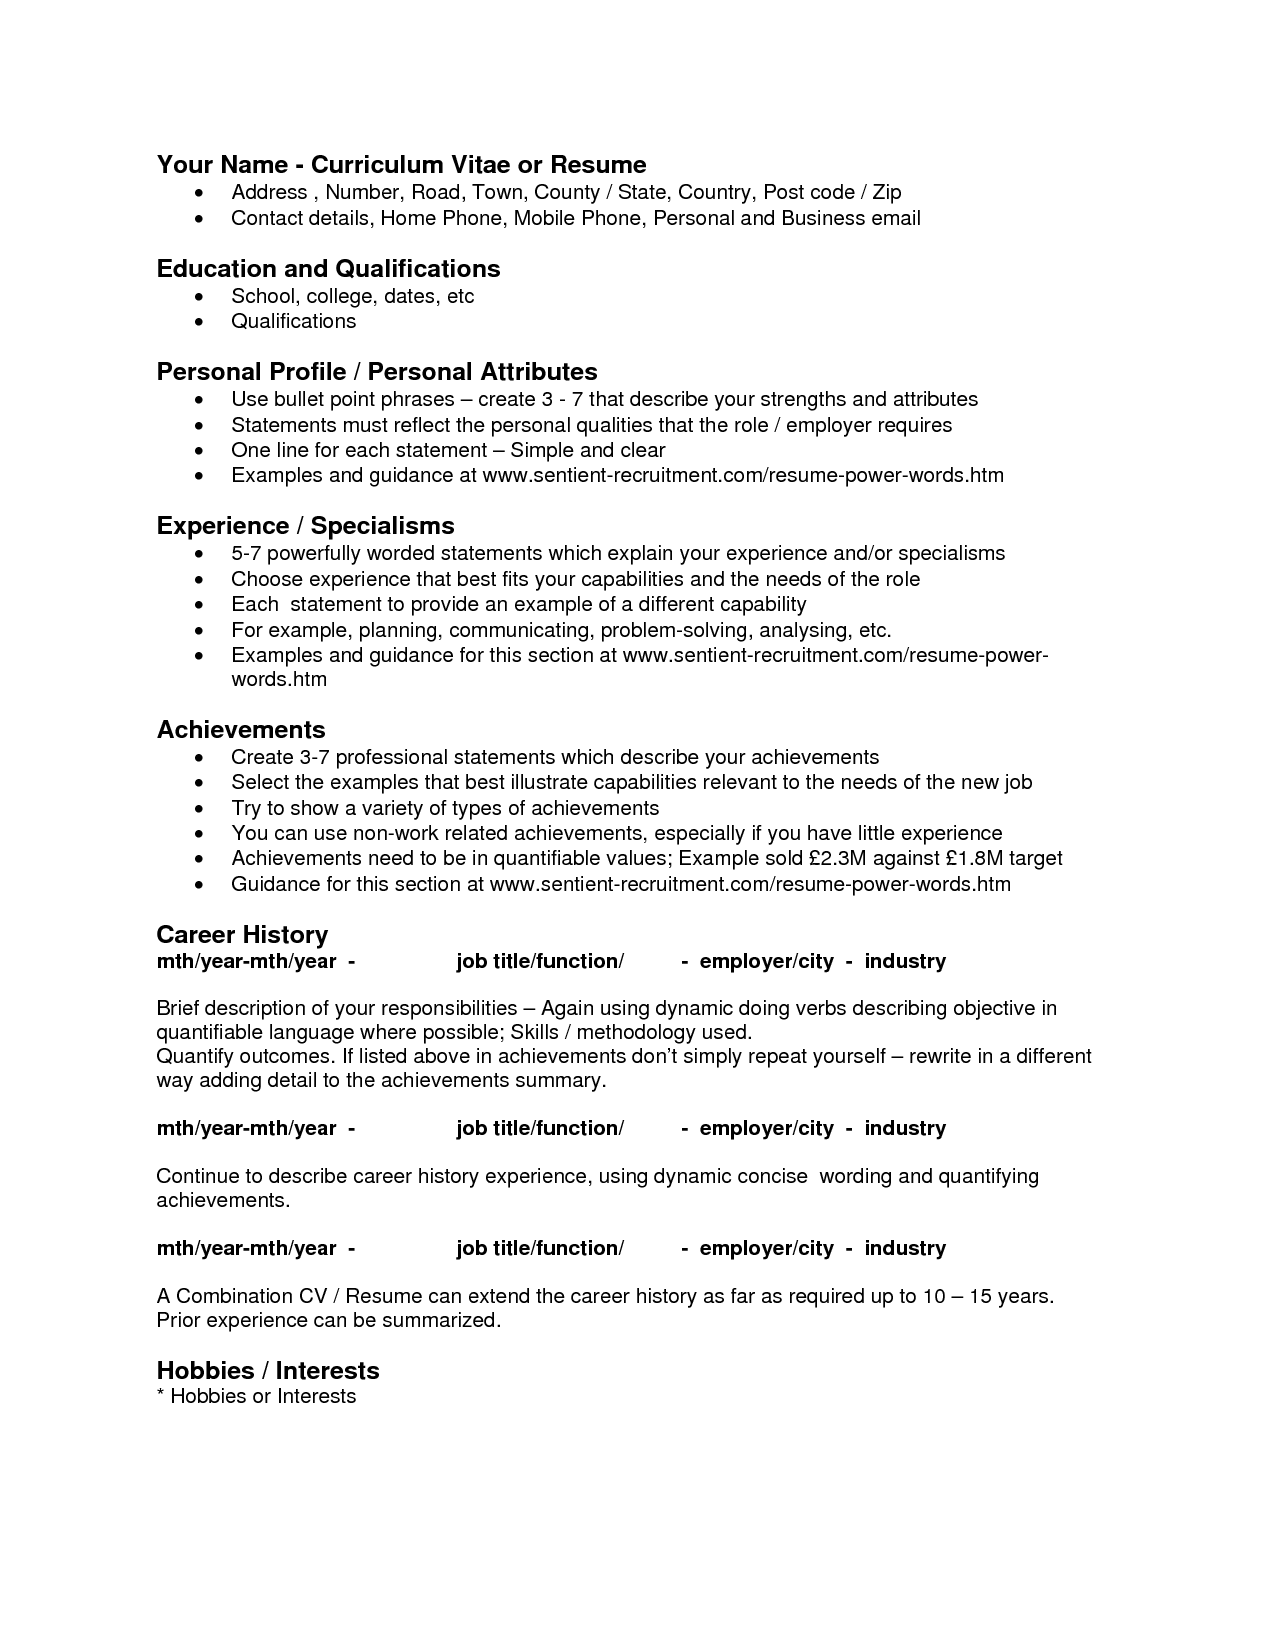 Qualities Resume examples, Job resume examples